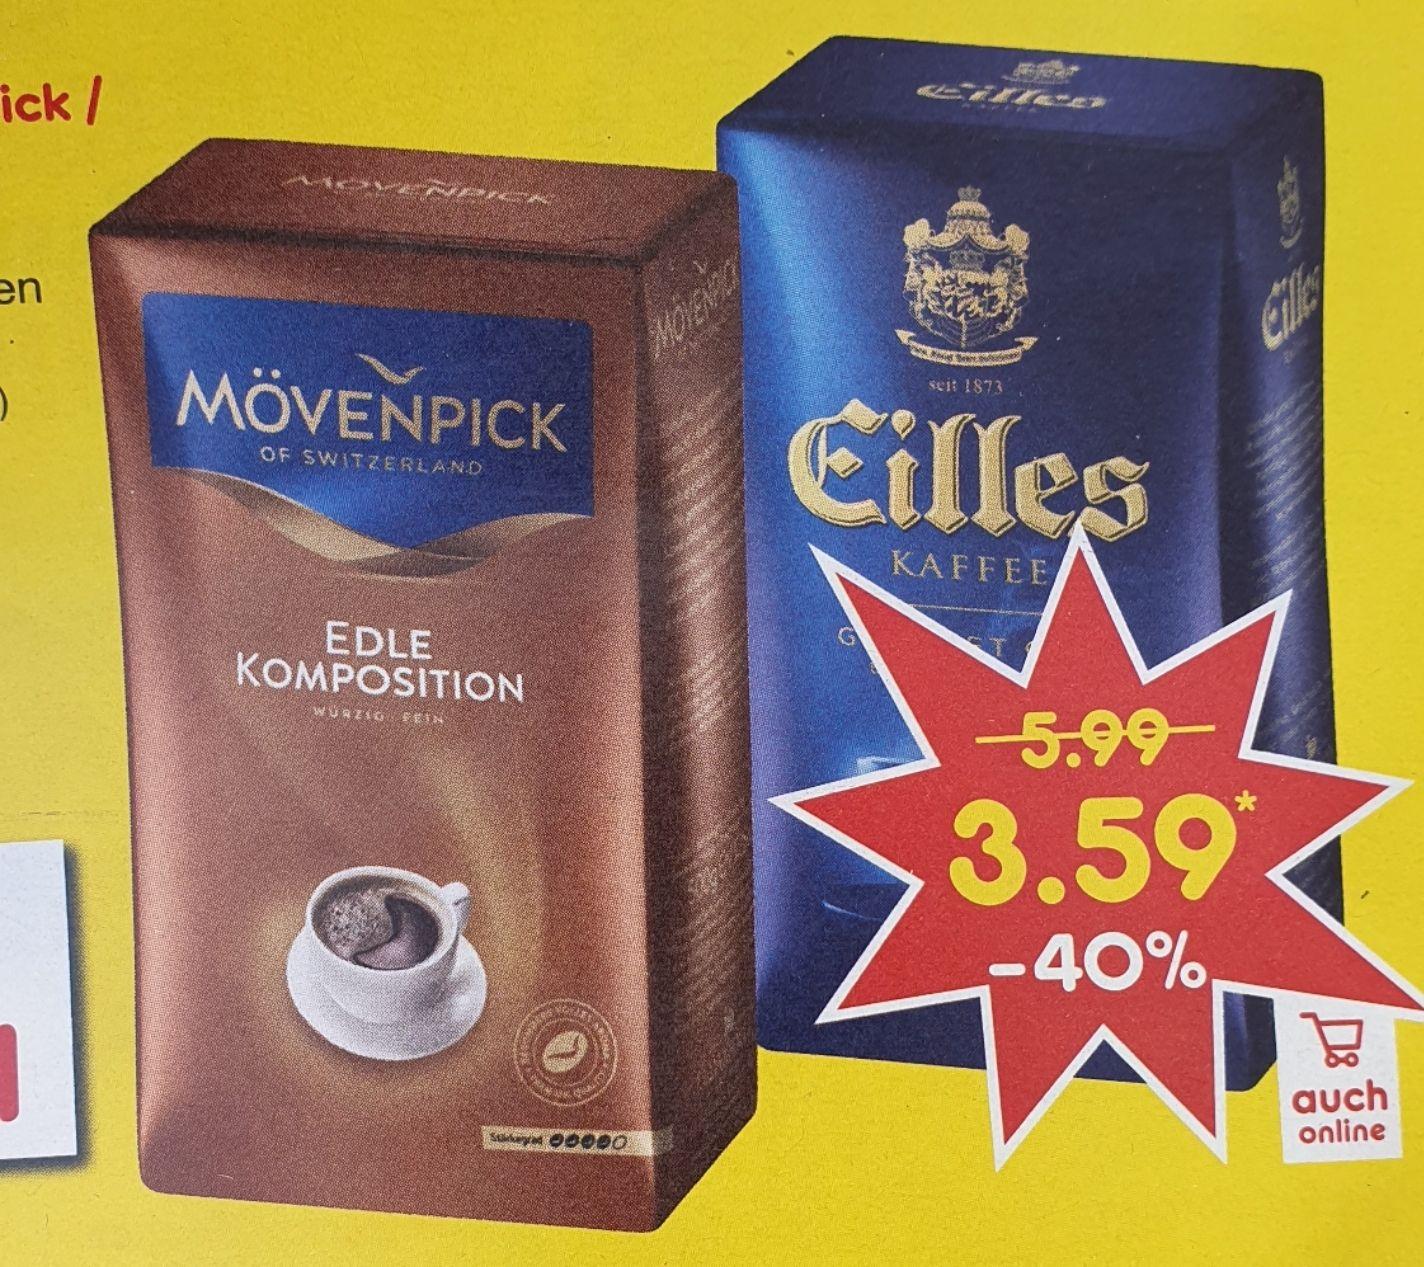 [Netto] Mövenpick / Eilles Kaffee gemahlen 500g